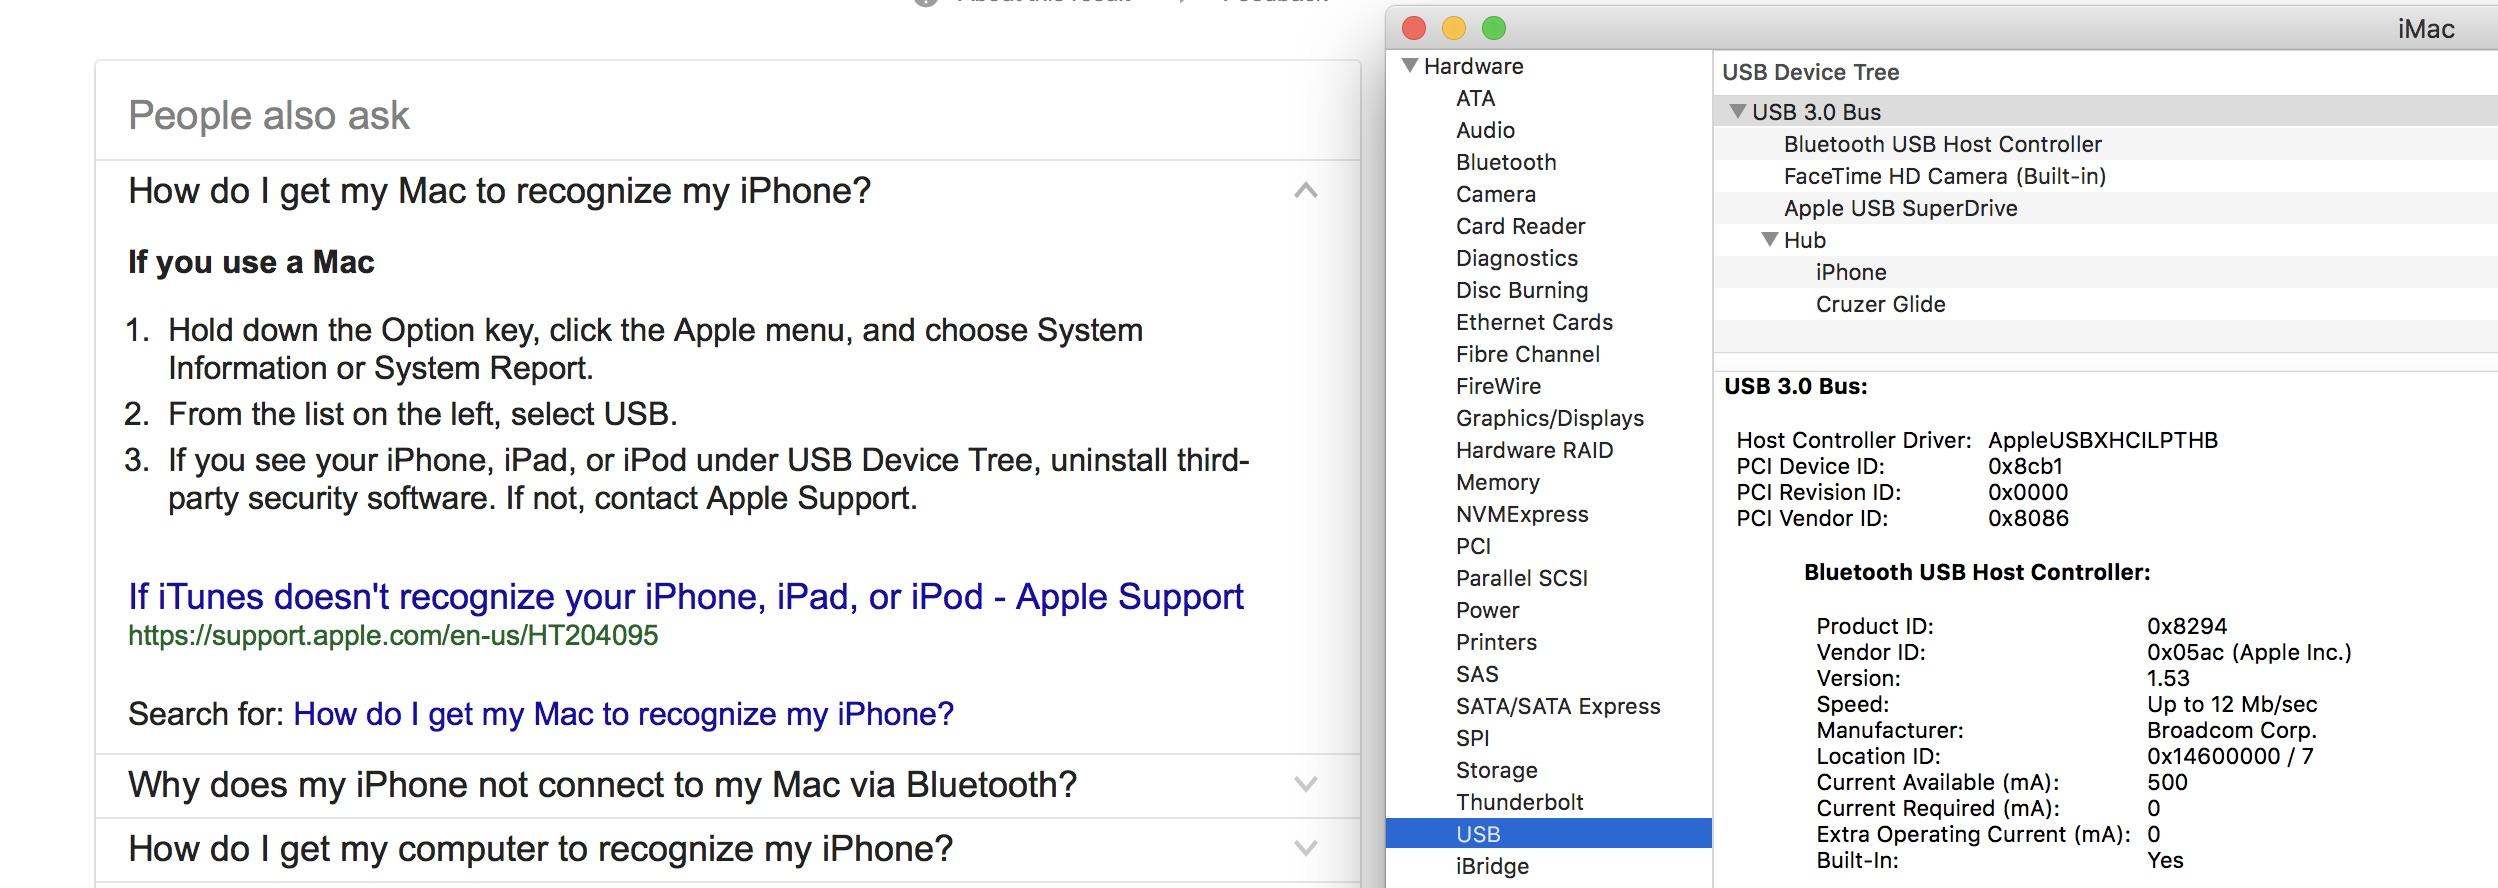 iMac 10 13 2 won't recognize iPhone 1… - Apple Community